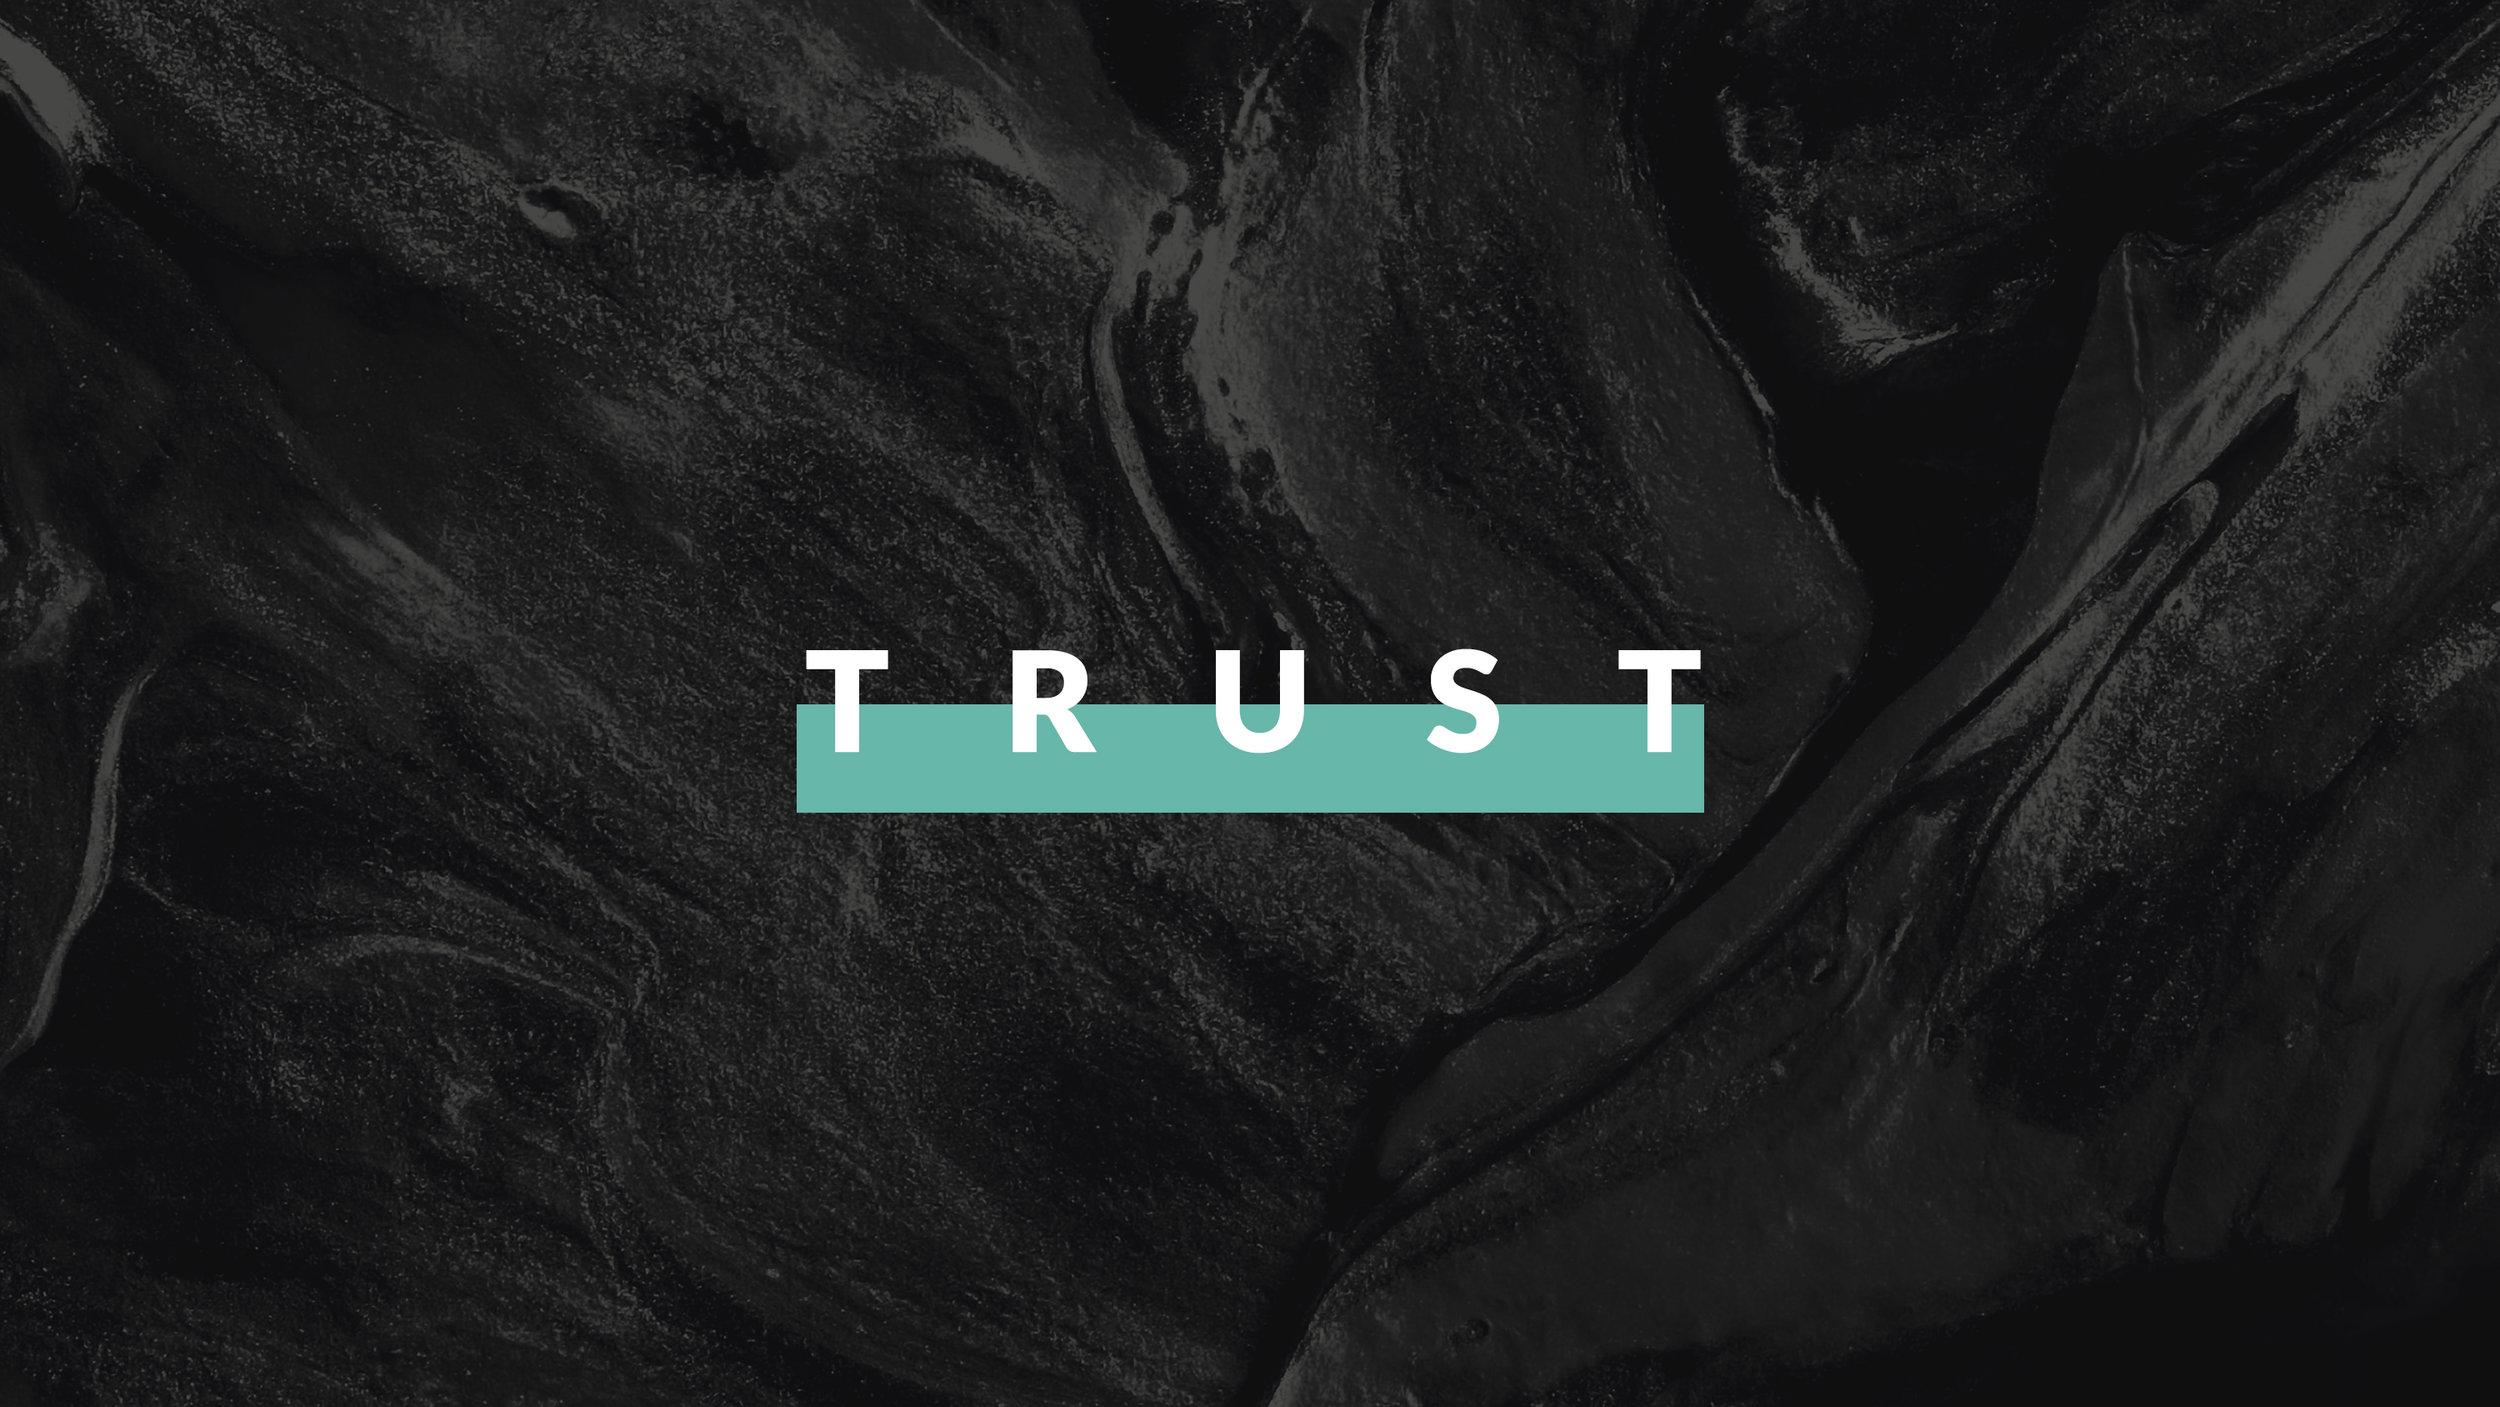 Trust Title.jpg